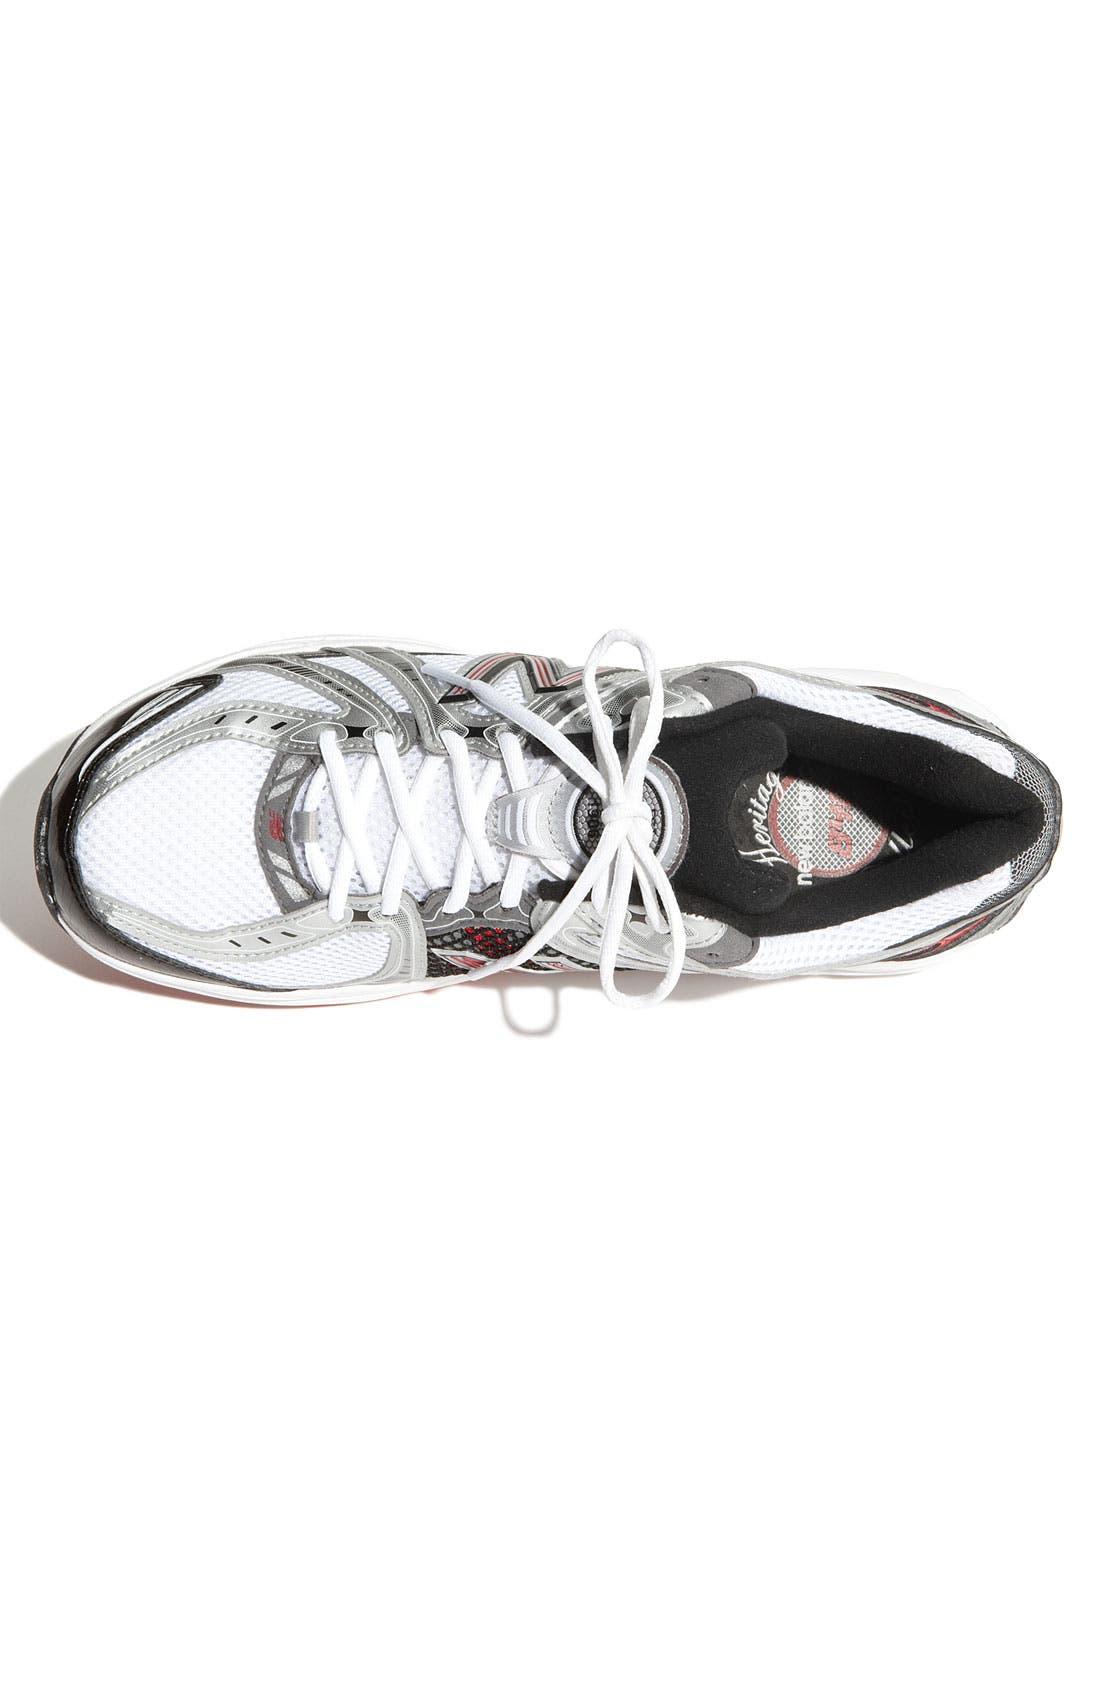 Alternate Image 3  - New Balance '840' Running Shoe (Men) (Online Only)